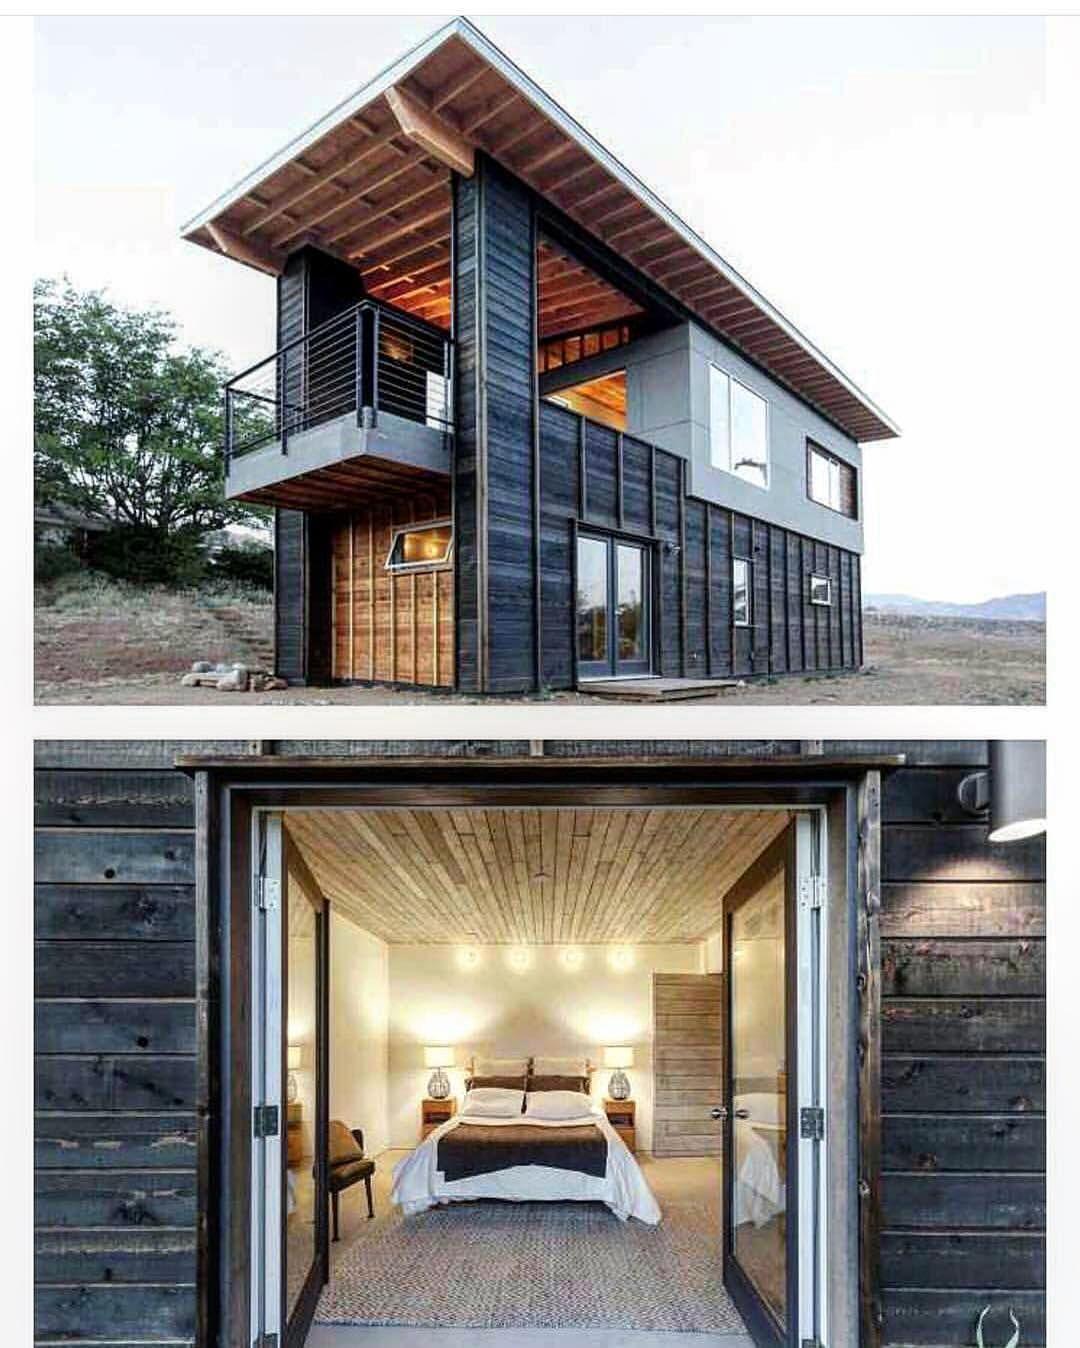 pin de german en contenedores pinterest. Black Bedroom Furniture Sets. Home Design Ideas